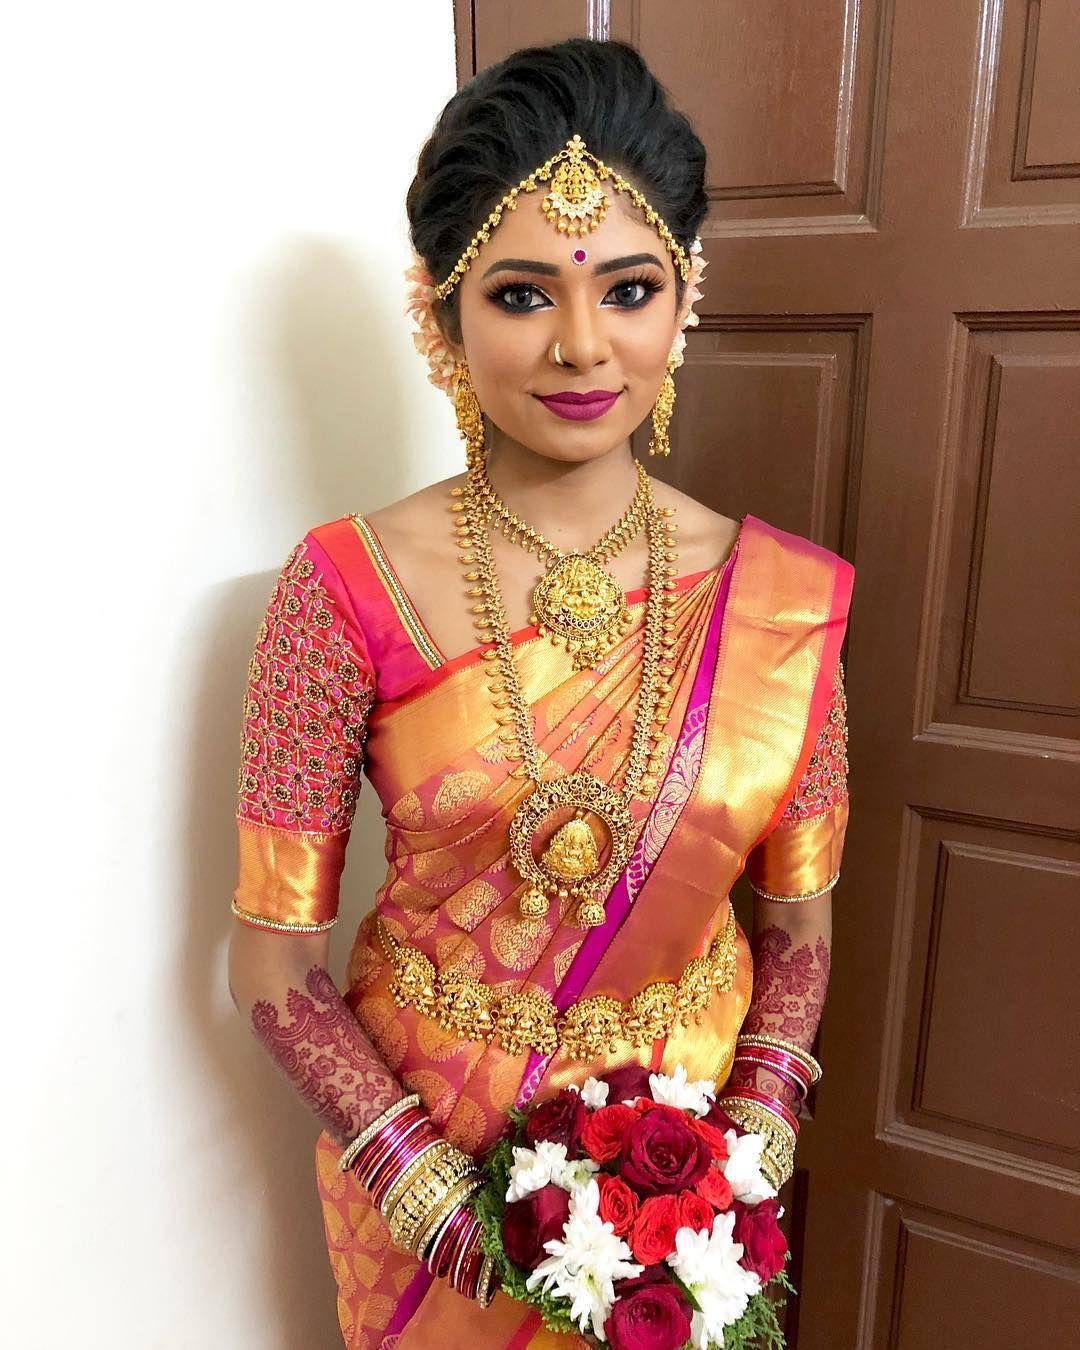 Our Stunning Bride Second Look Ashvinimurugesu Ashvini Murugesu Traditionalwedding Indiantraditionall Indian Bridal Hairstyles Stunning Bride Bride